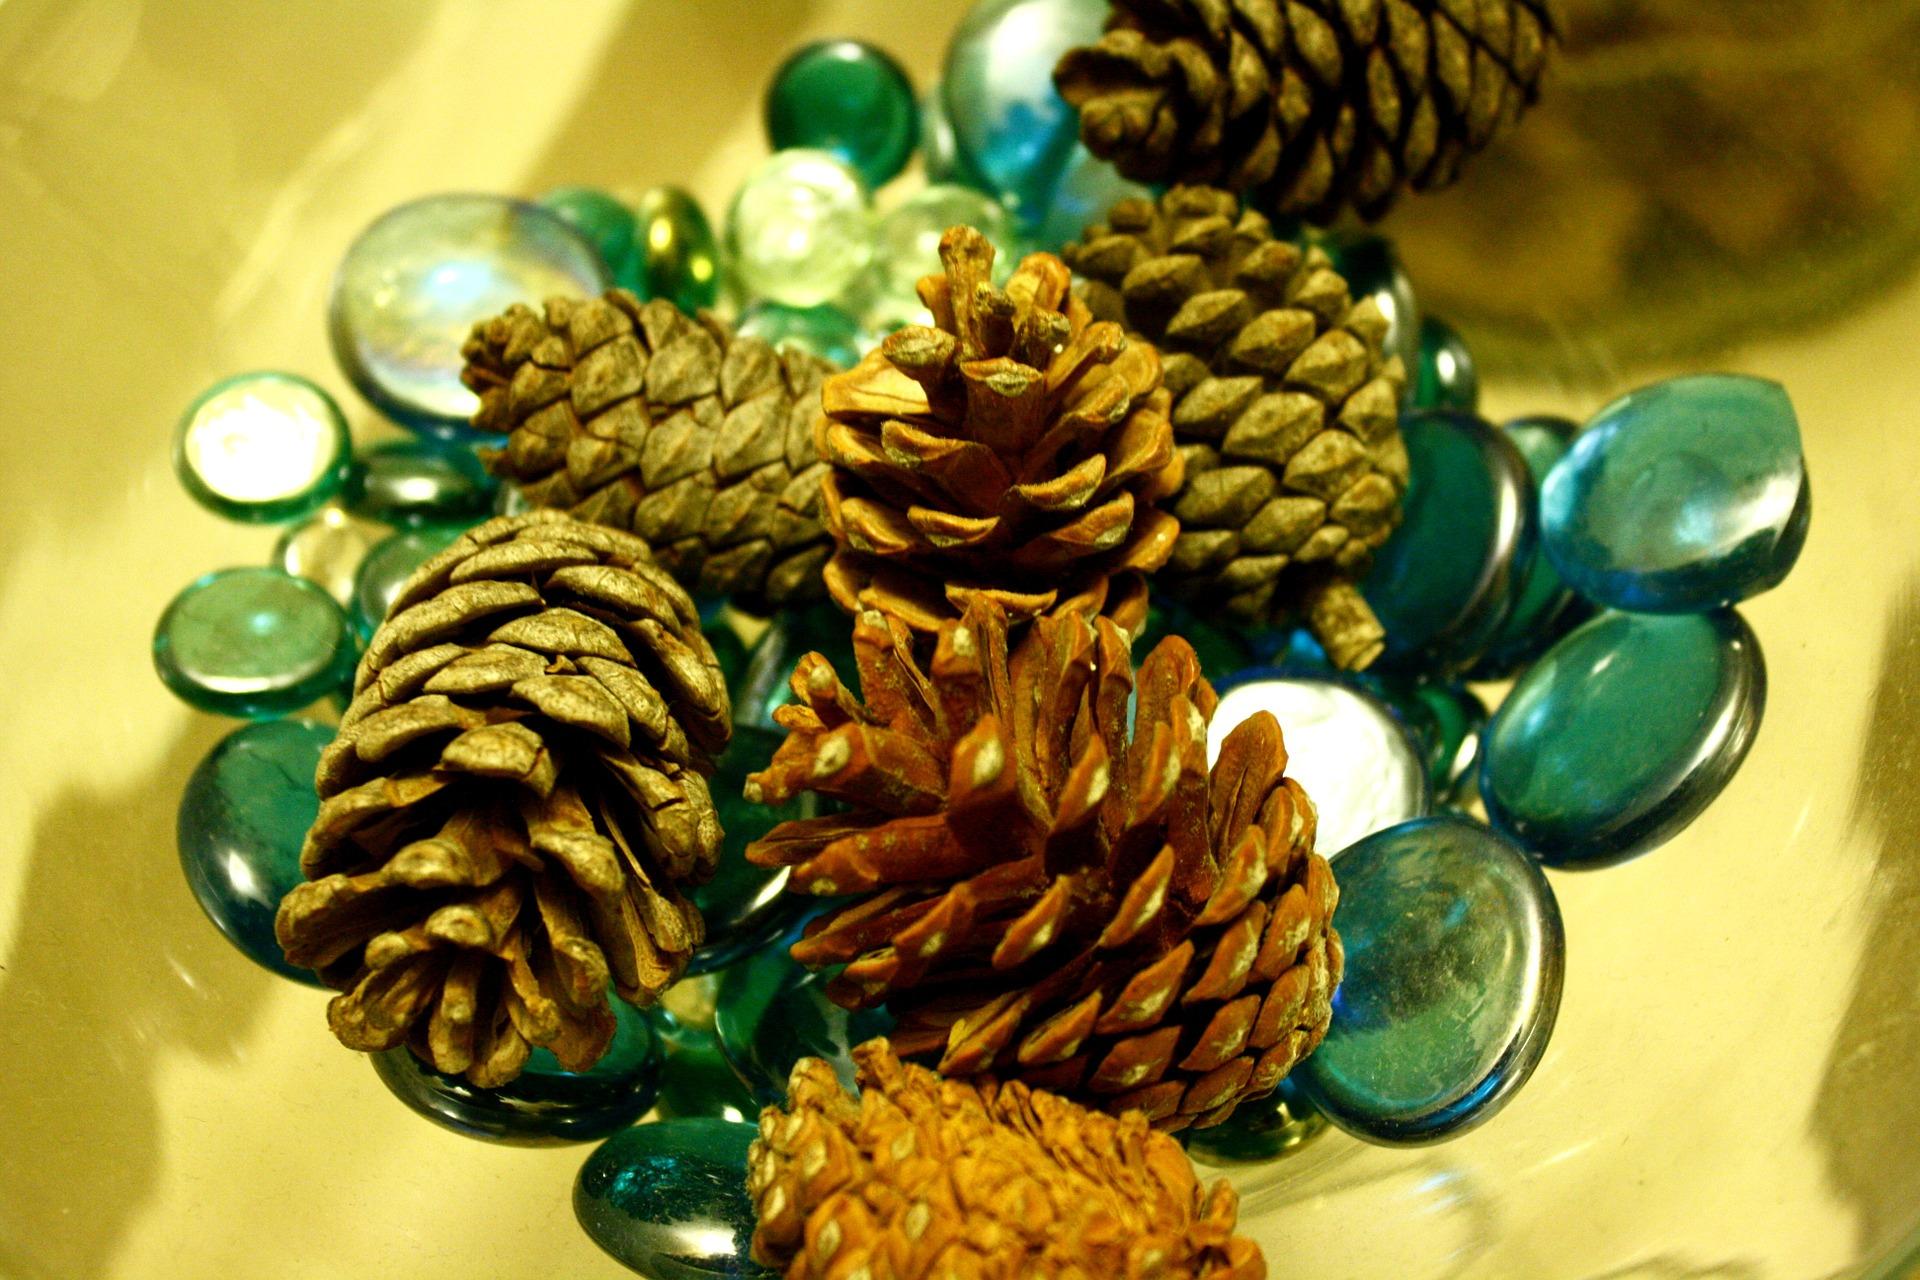 cristal norocos - acvamarin - sfatulparintilor.ro - pixabay_com - pineapple-723319_1920